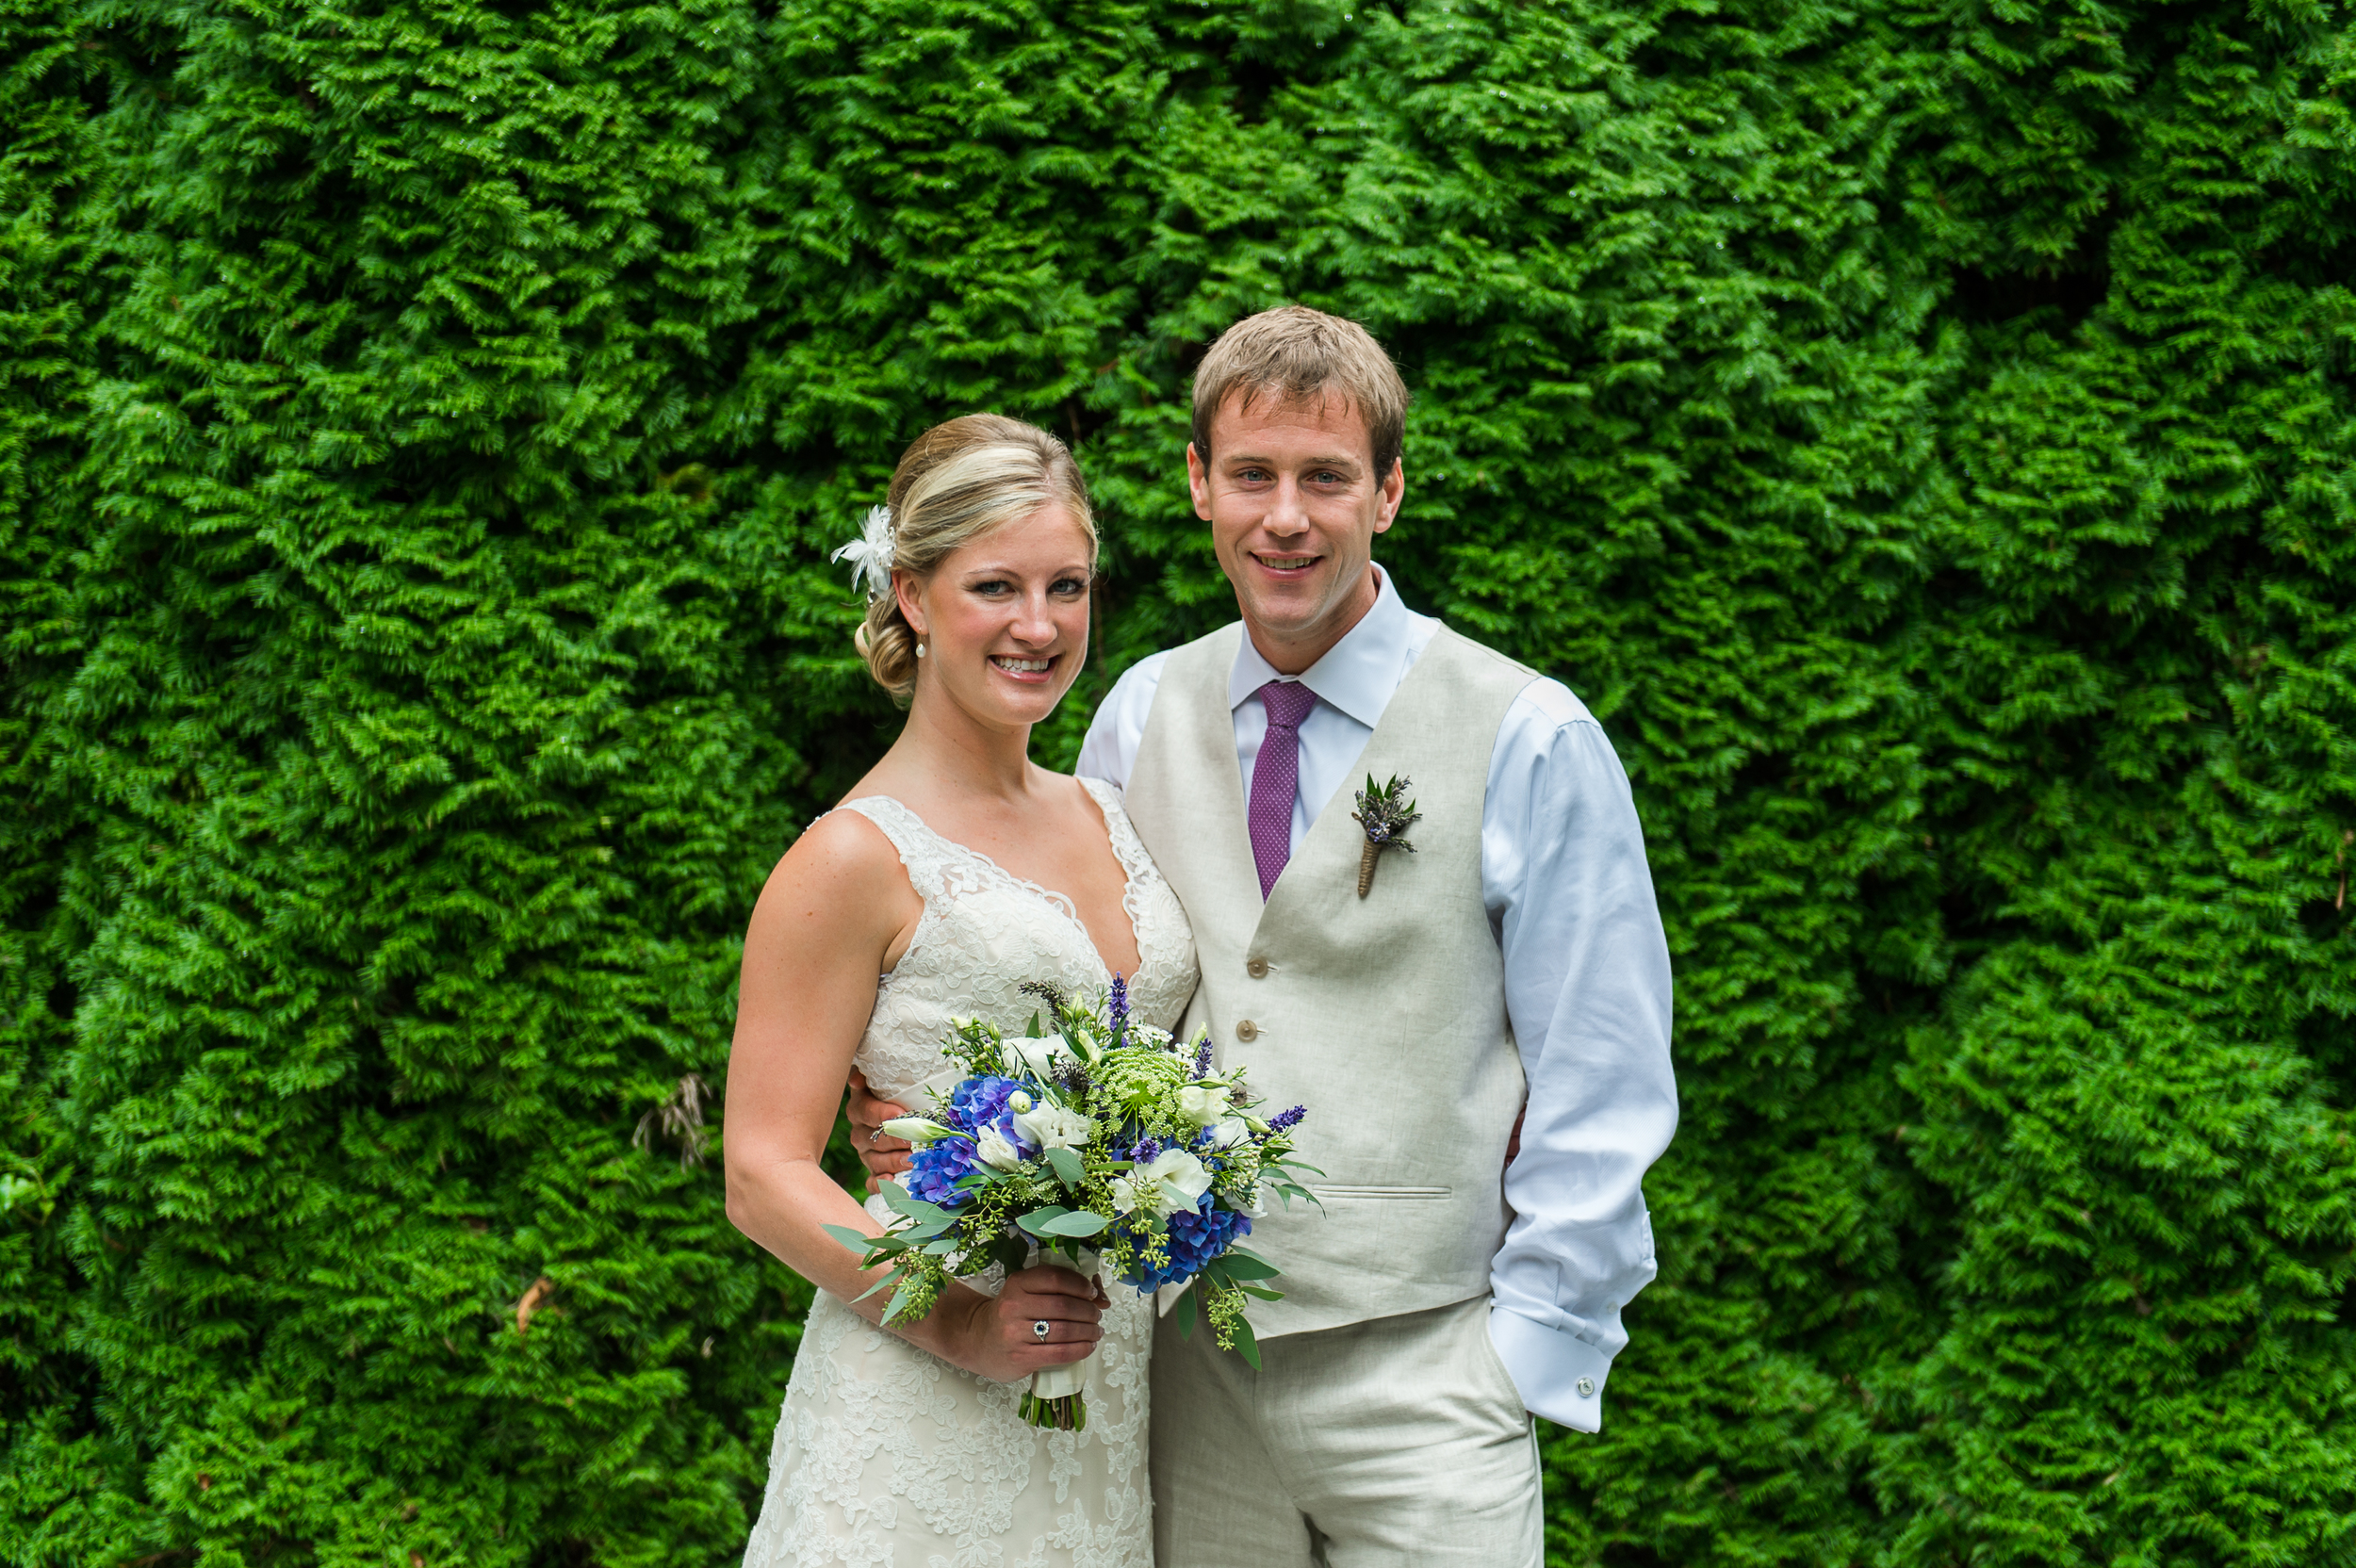 JJ-wedding-Van-Wyhe-Photography-239.jpg